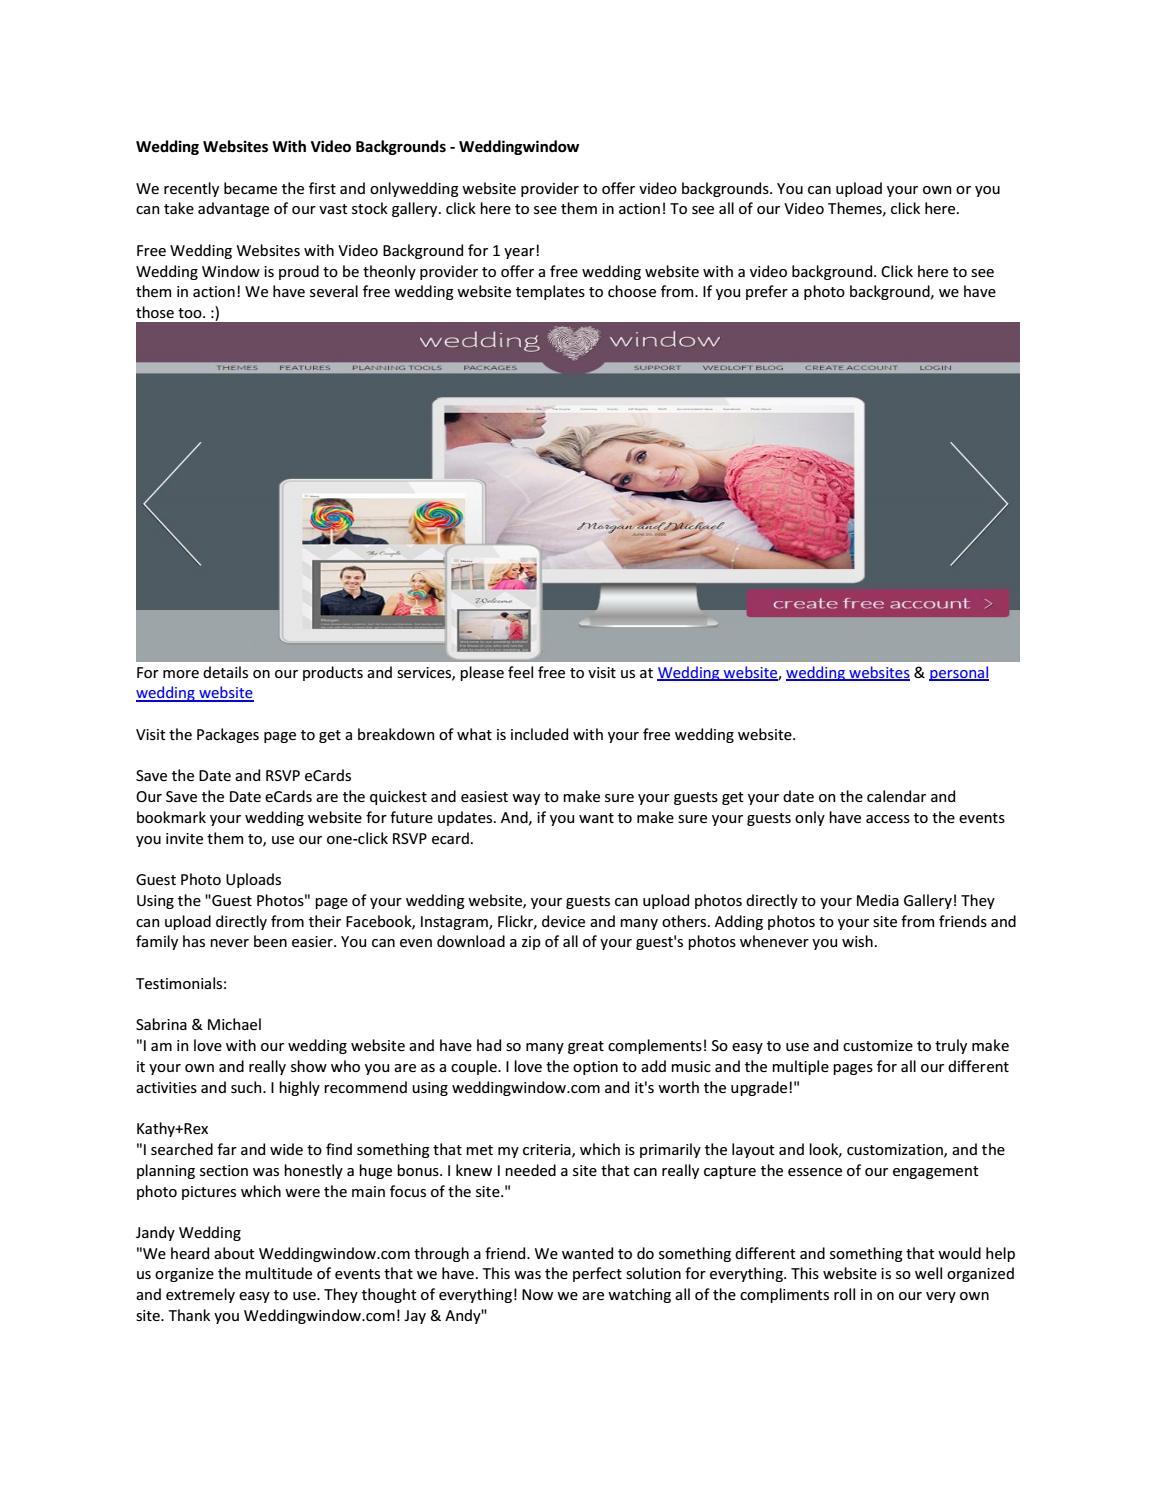 Wedding Websites With Video Backgrounds Weddingwindow By Personalweddingwebsites Issuu